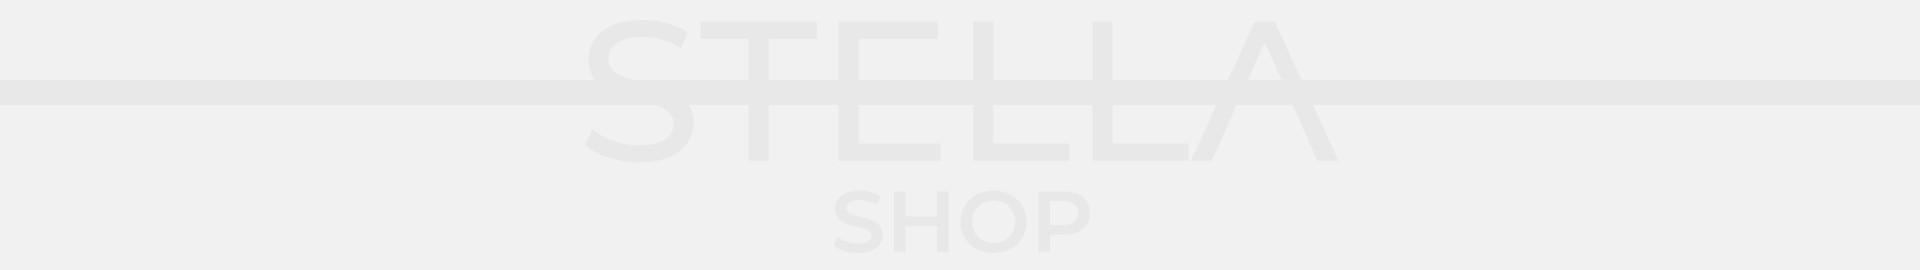 Saldi by Stella Shop